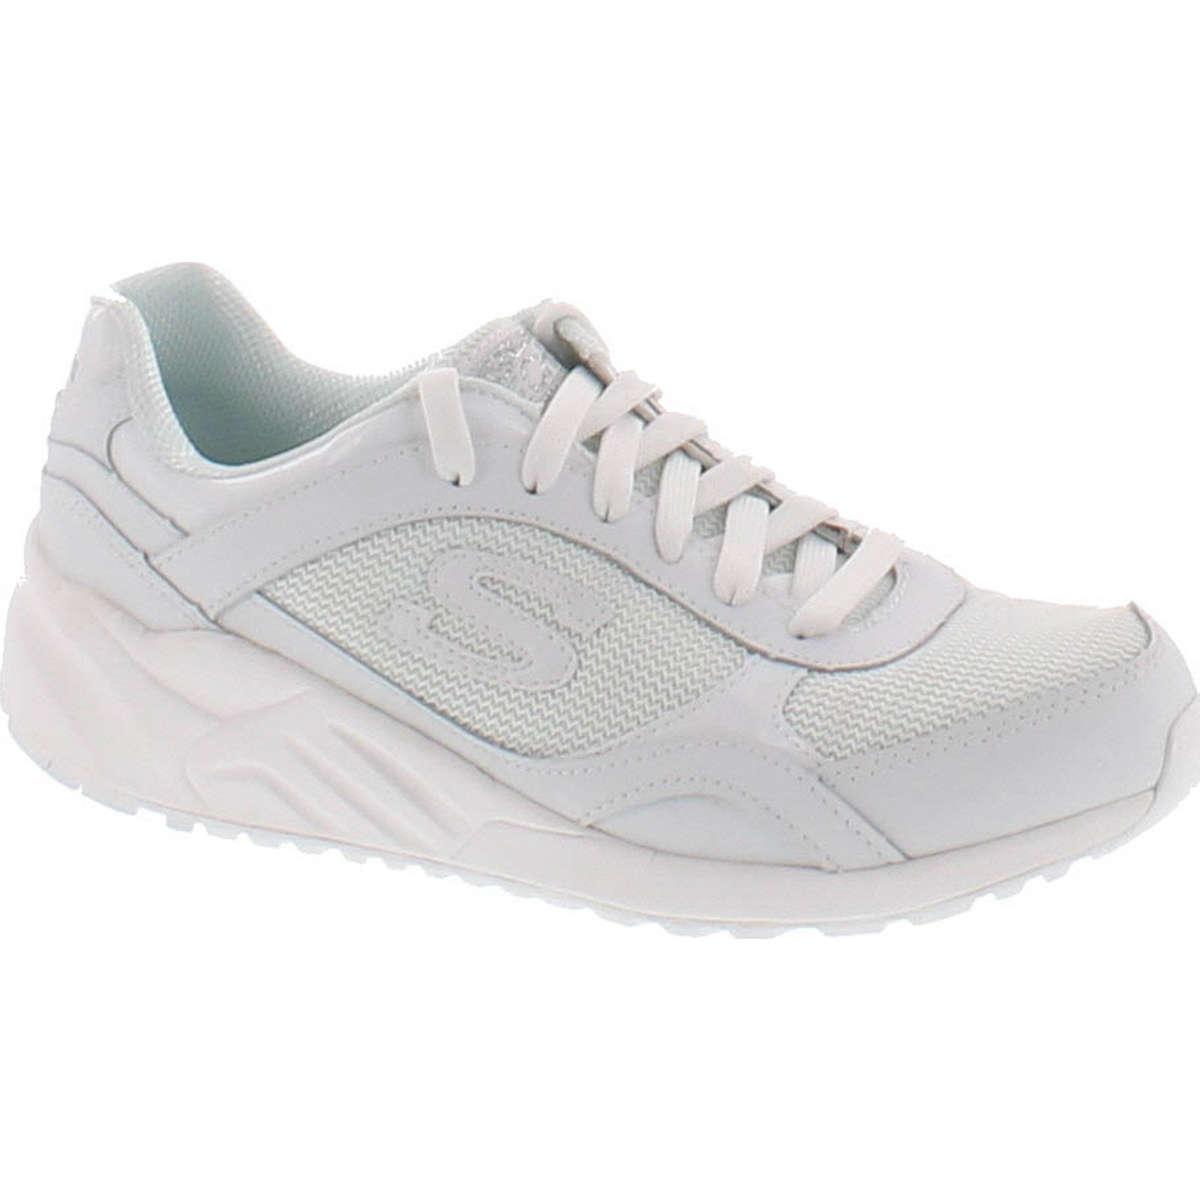 Skechers | Athletic & Sneakers, Sandals, & More |